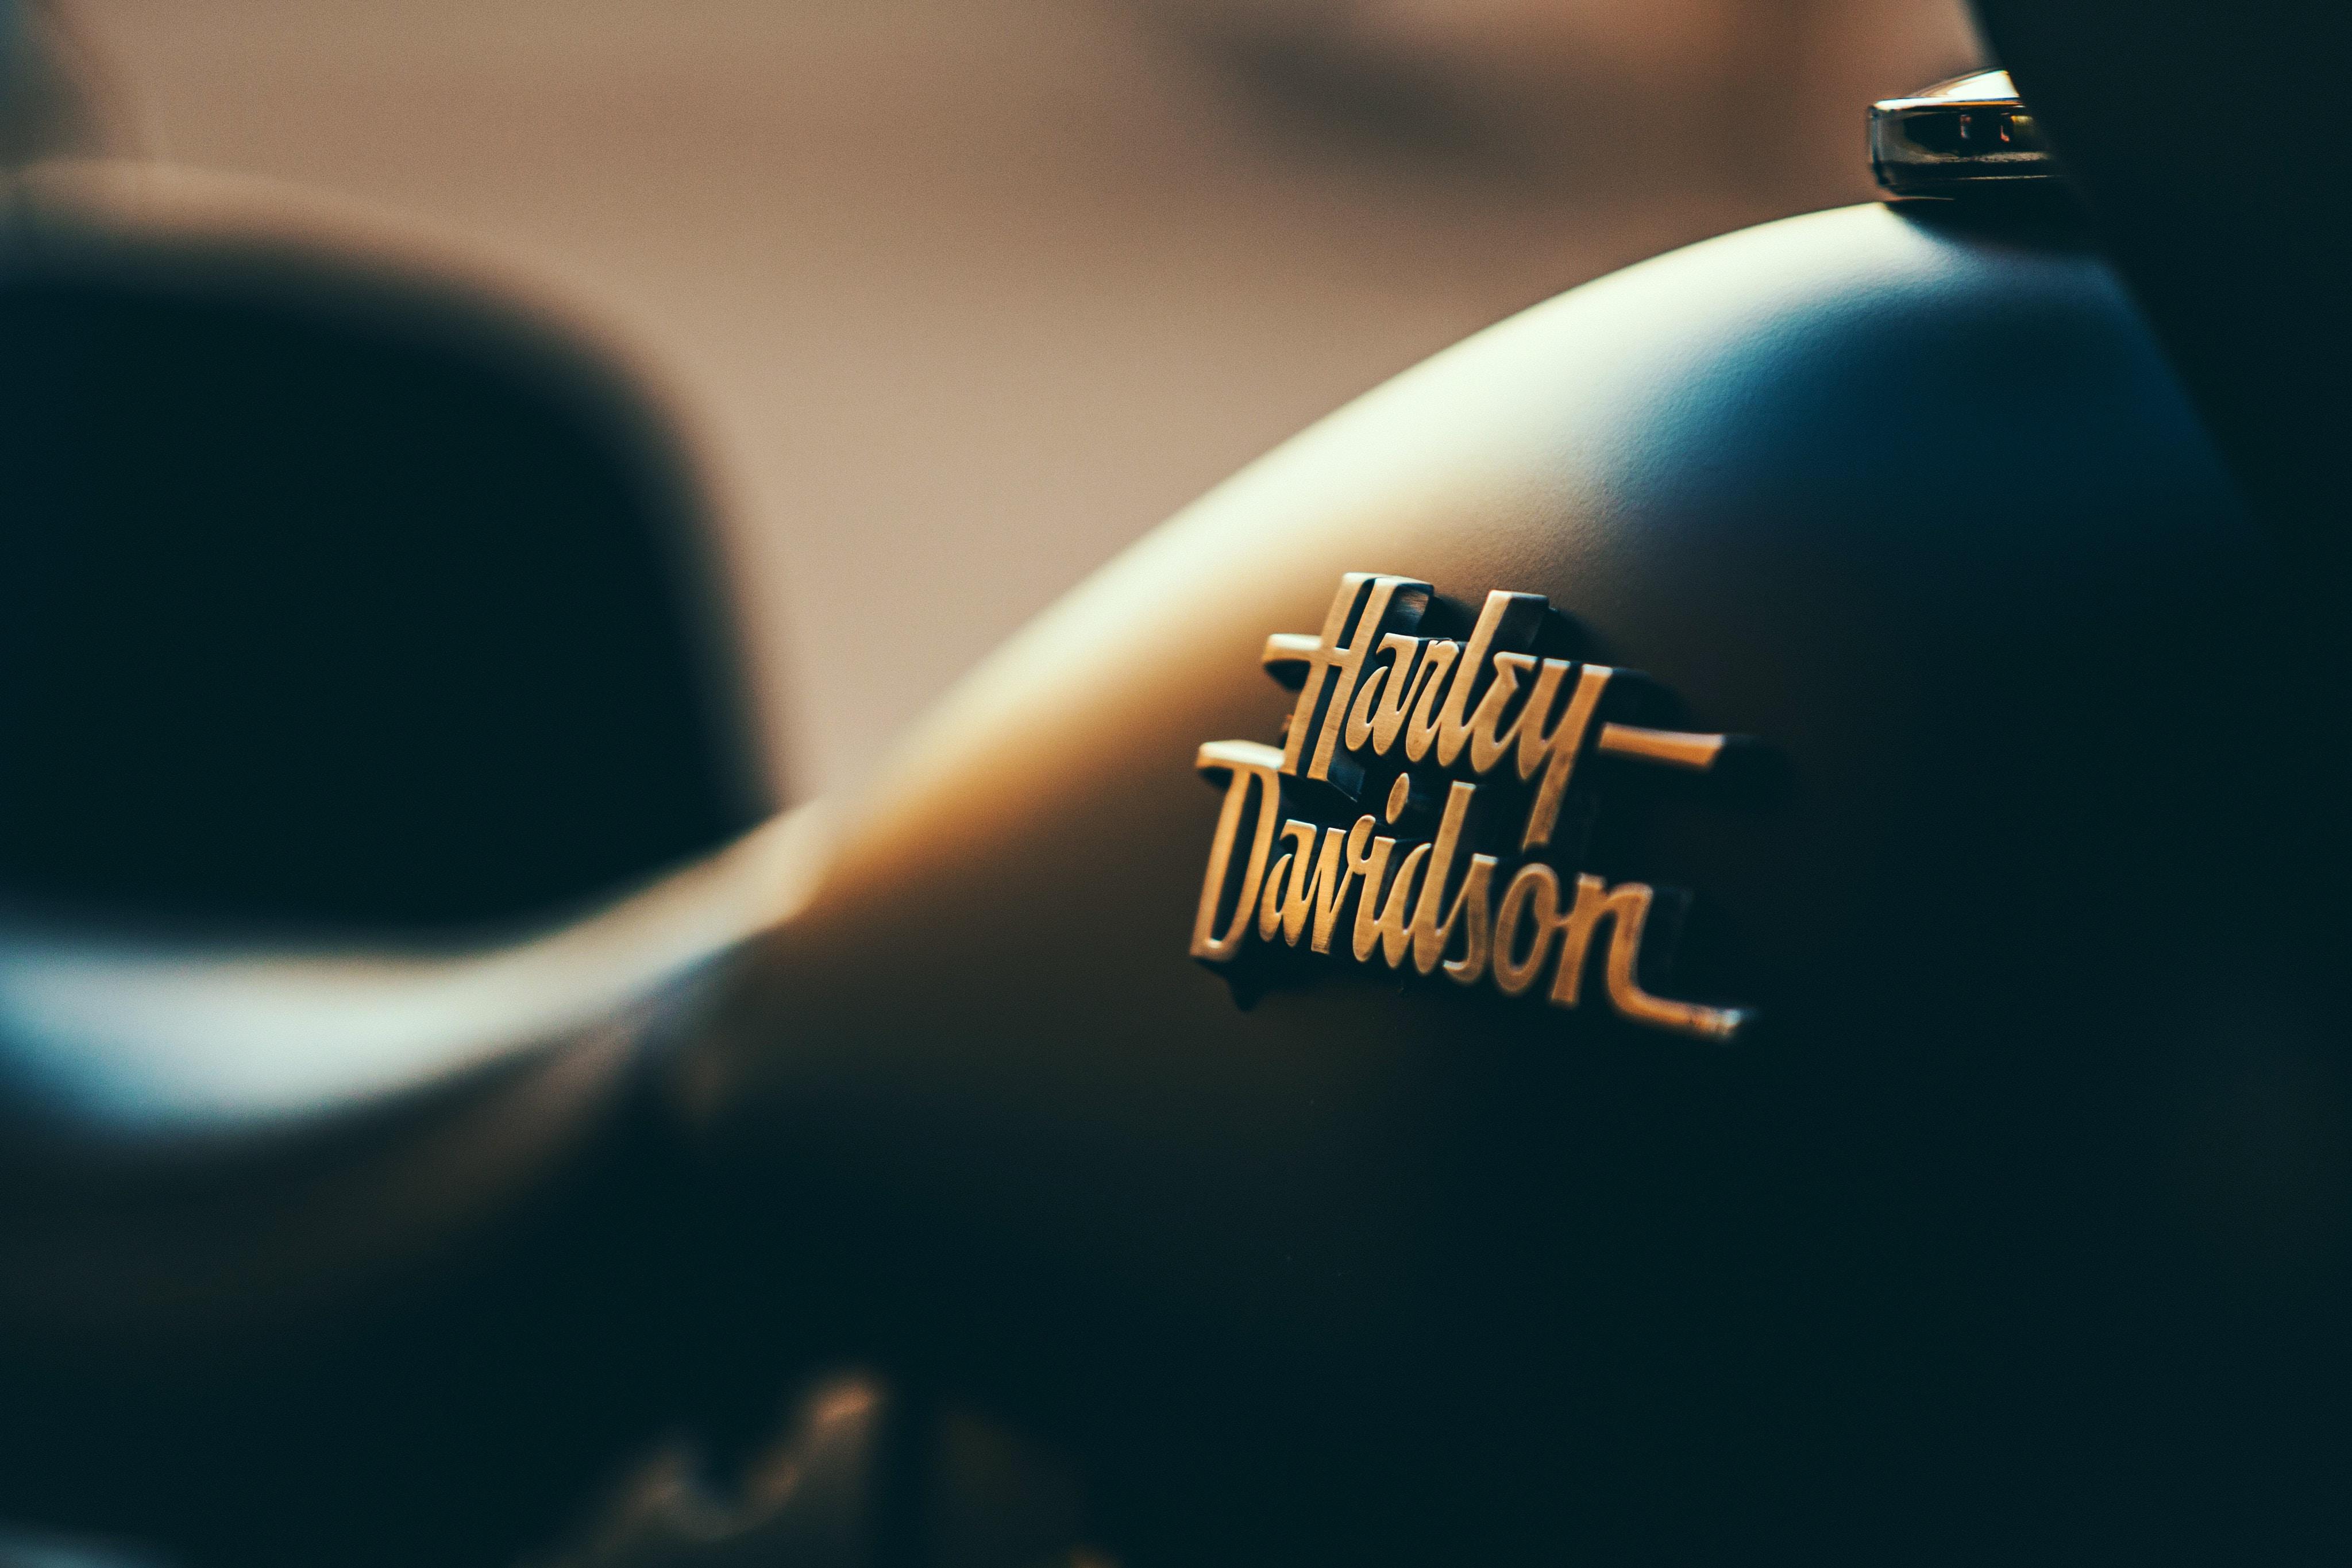 black Harley-Davidson motorcycle fuel tank